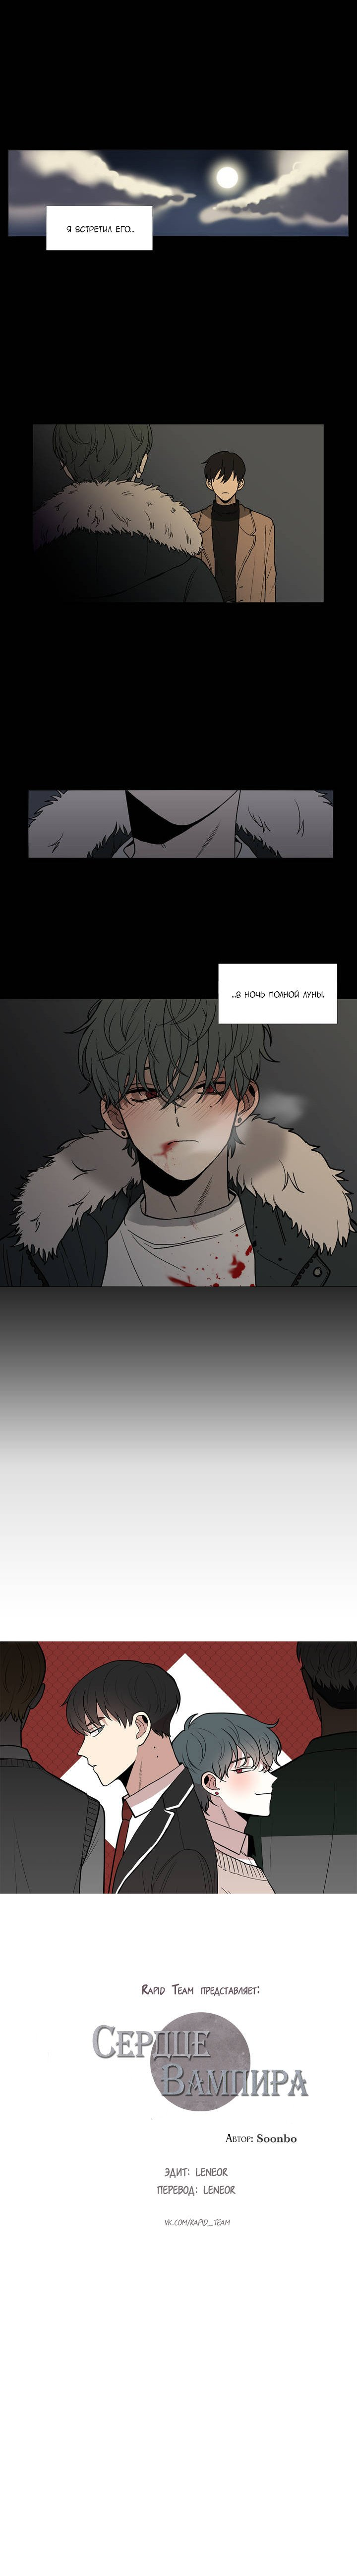 Манга Сердце Вампира - Глава 0 Страница 1